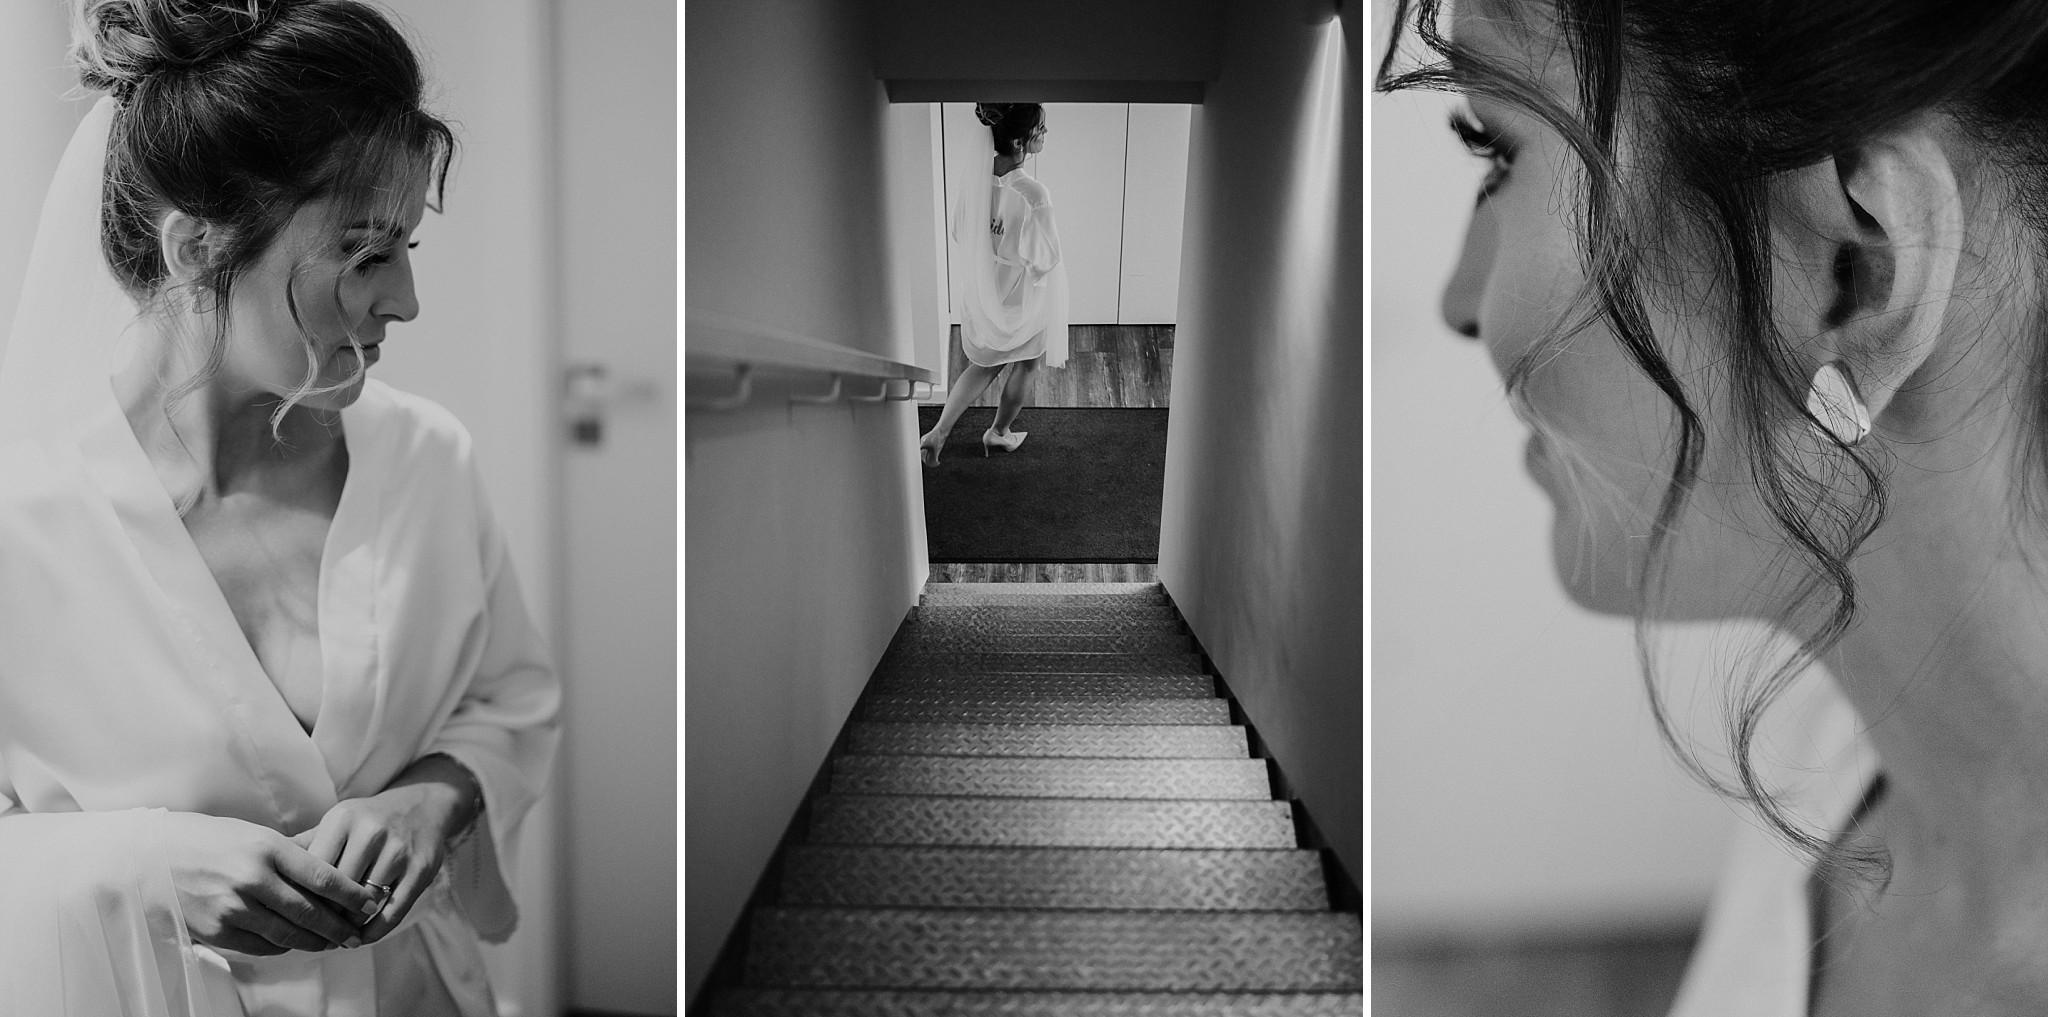 fotograf poznan wesele dobra truskawka piekne wesele pod poznaniem wesele w dobrej truskawce piekna para mloda slub marzen slub koronawirus slub listopad wesele koronawirus 058